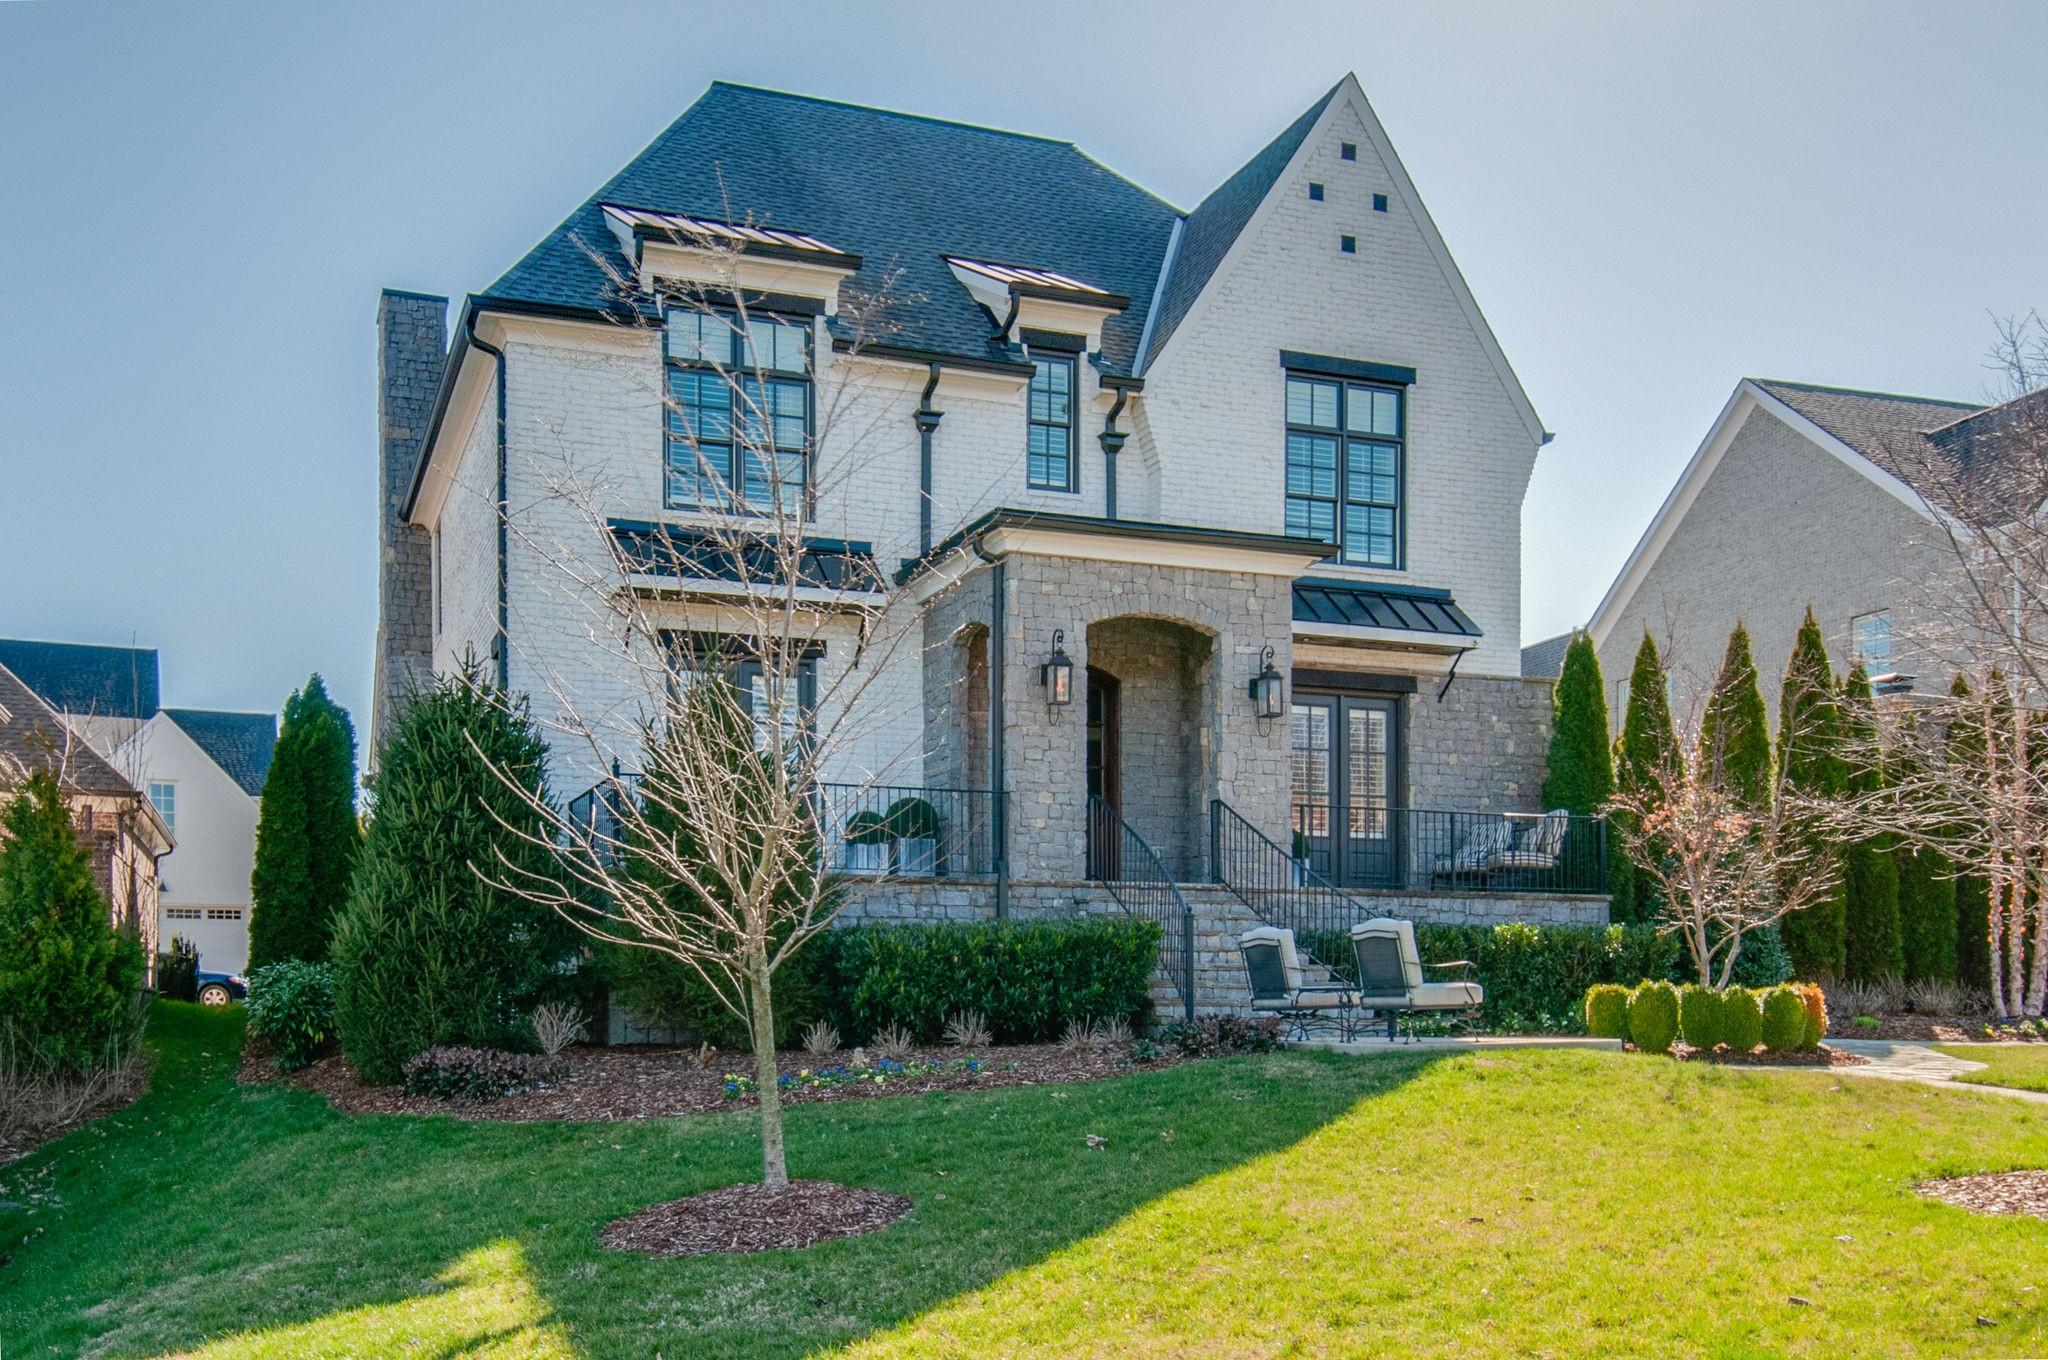 1719 Glen Echo Rd, Nashville, TN 37215 - Nashville, TN real estate listing